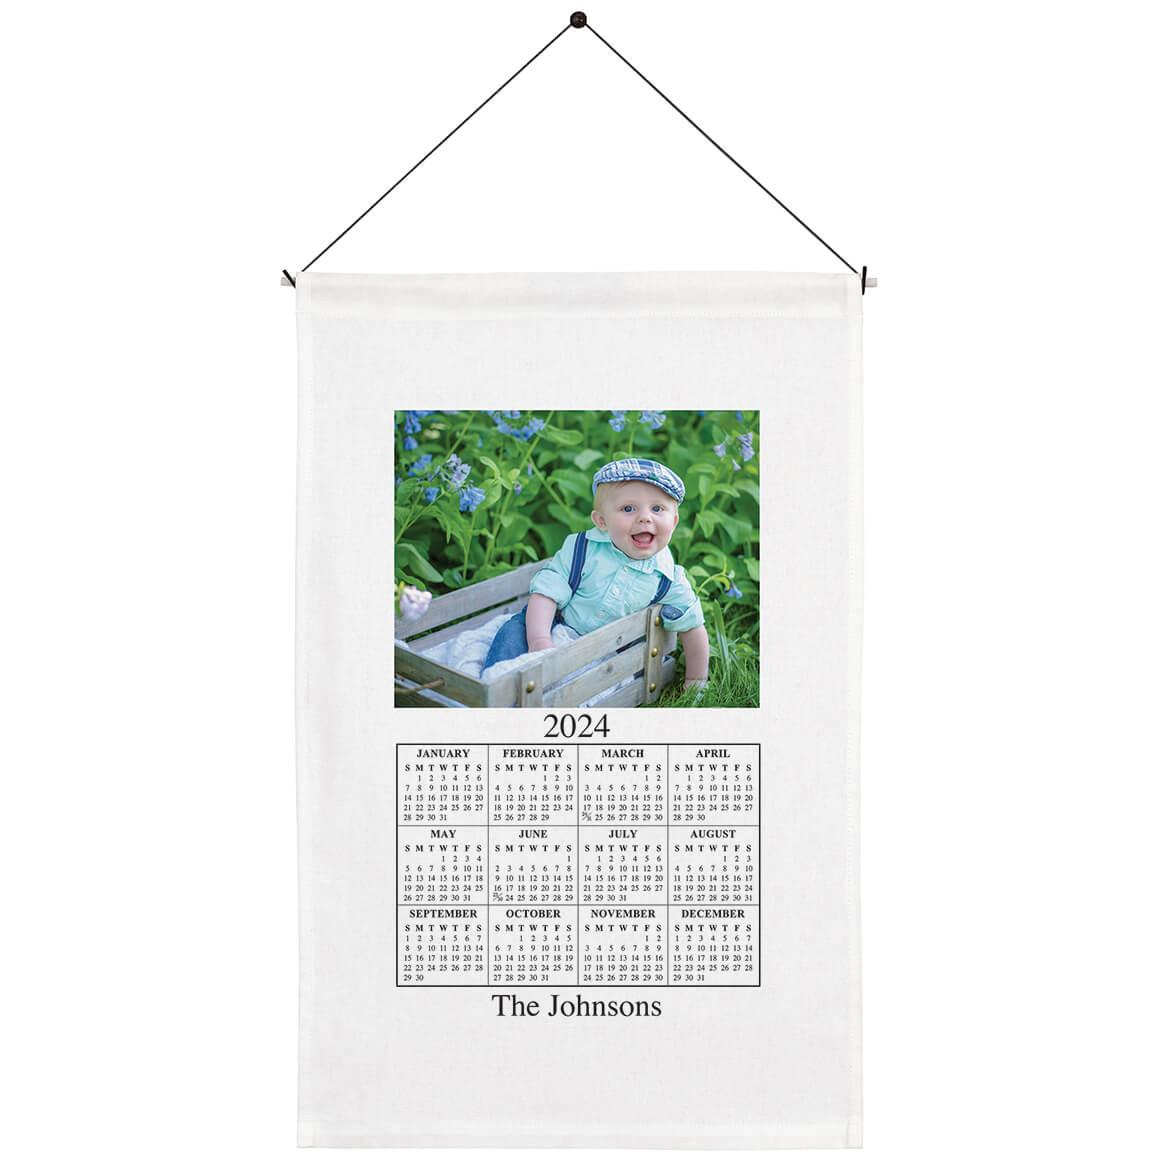 Personalized Photo Calendar Towel